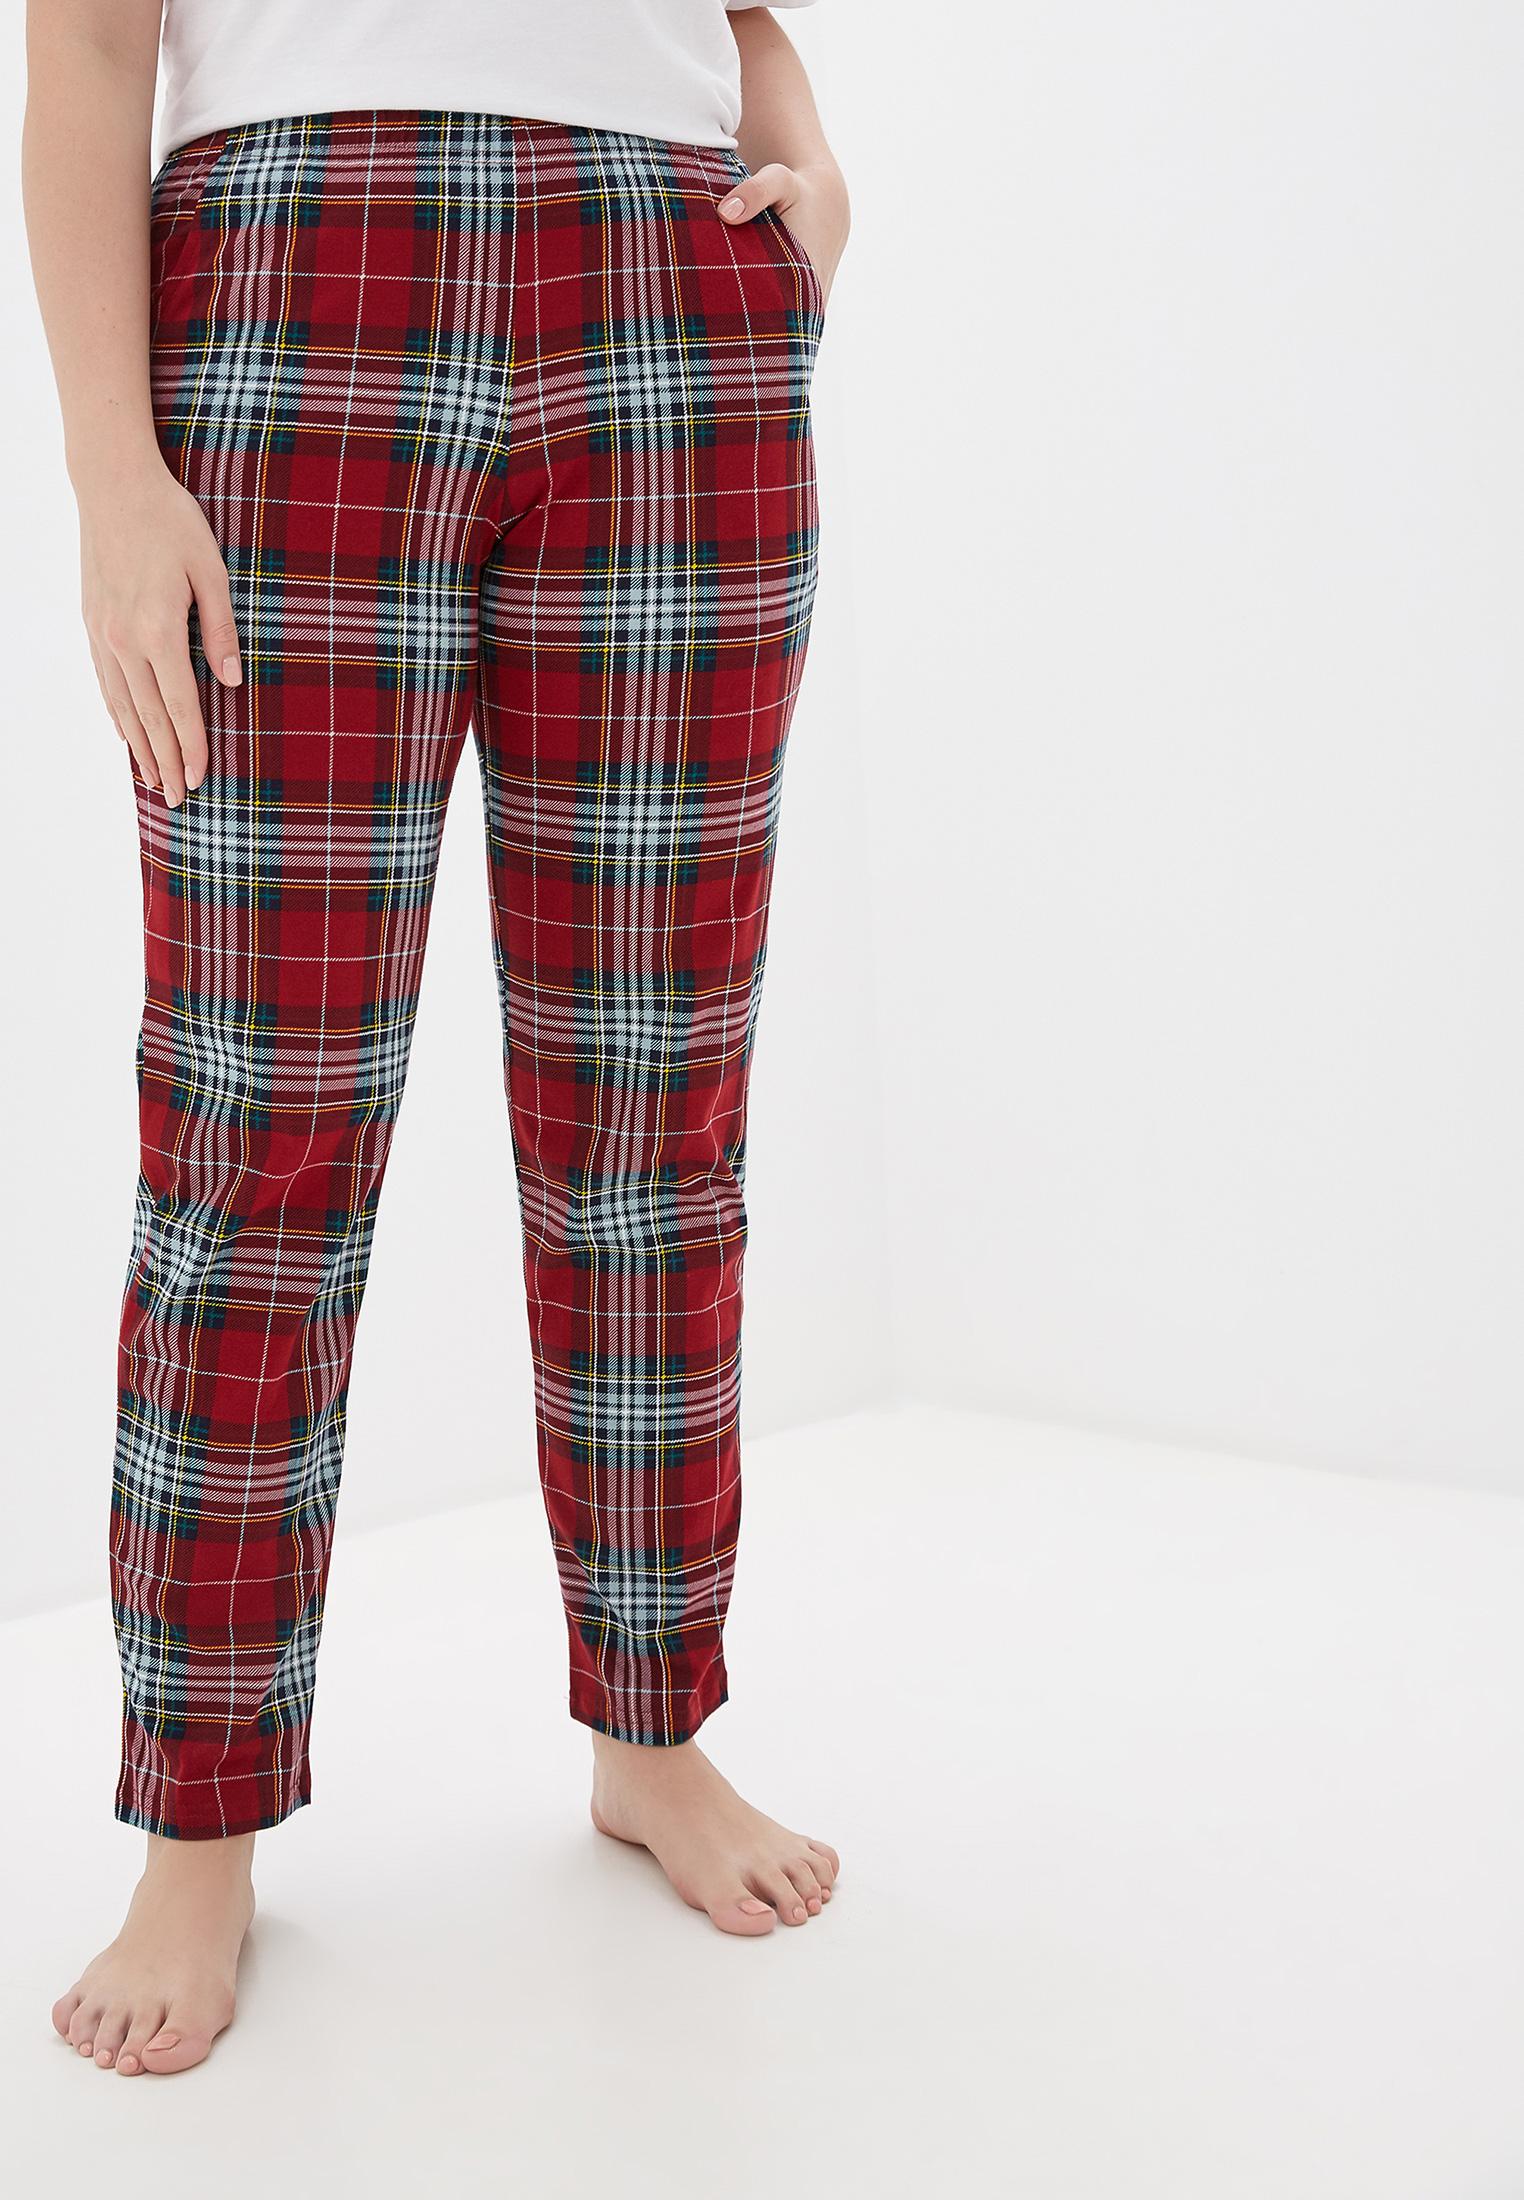 Женские домашние брюки Лори Б016-9